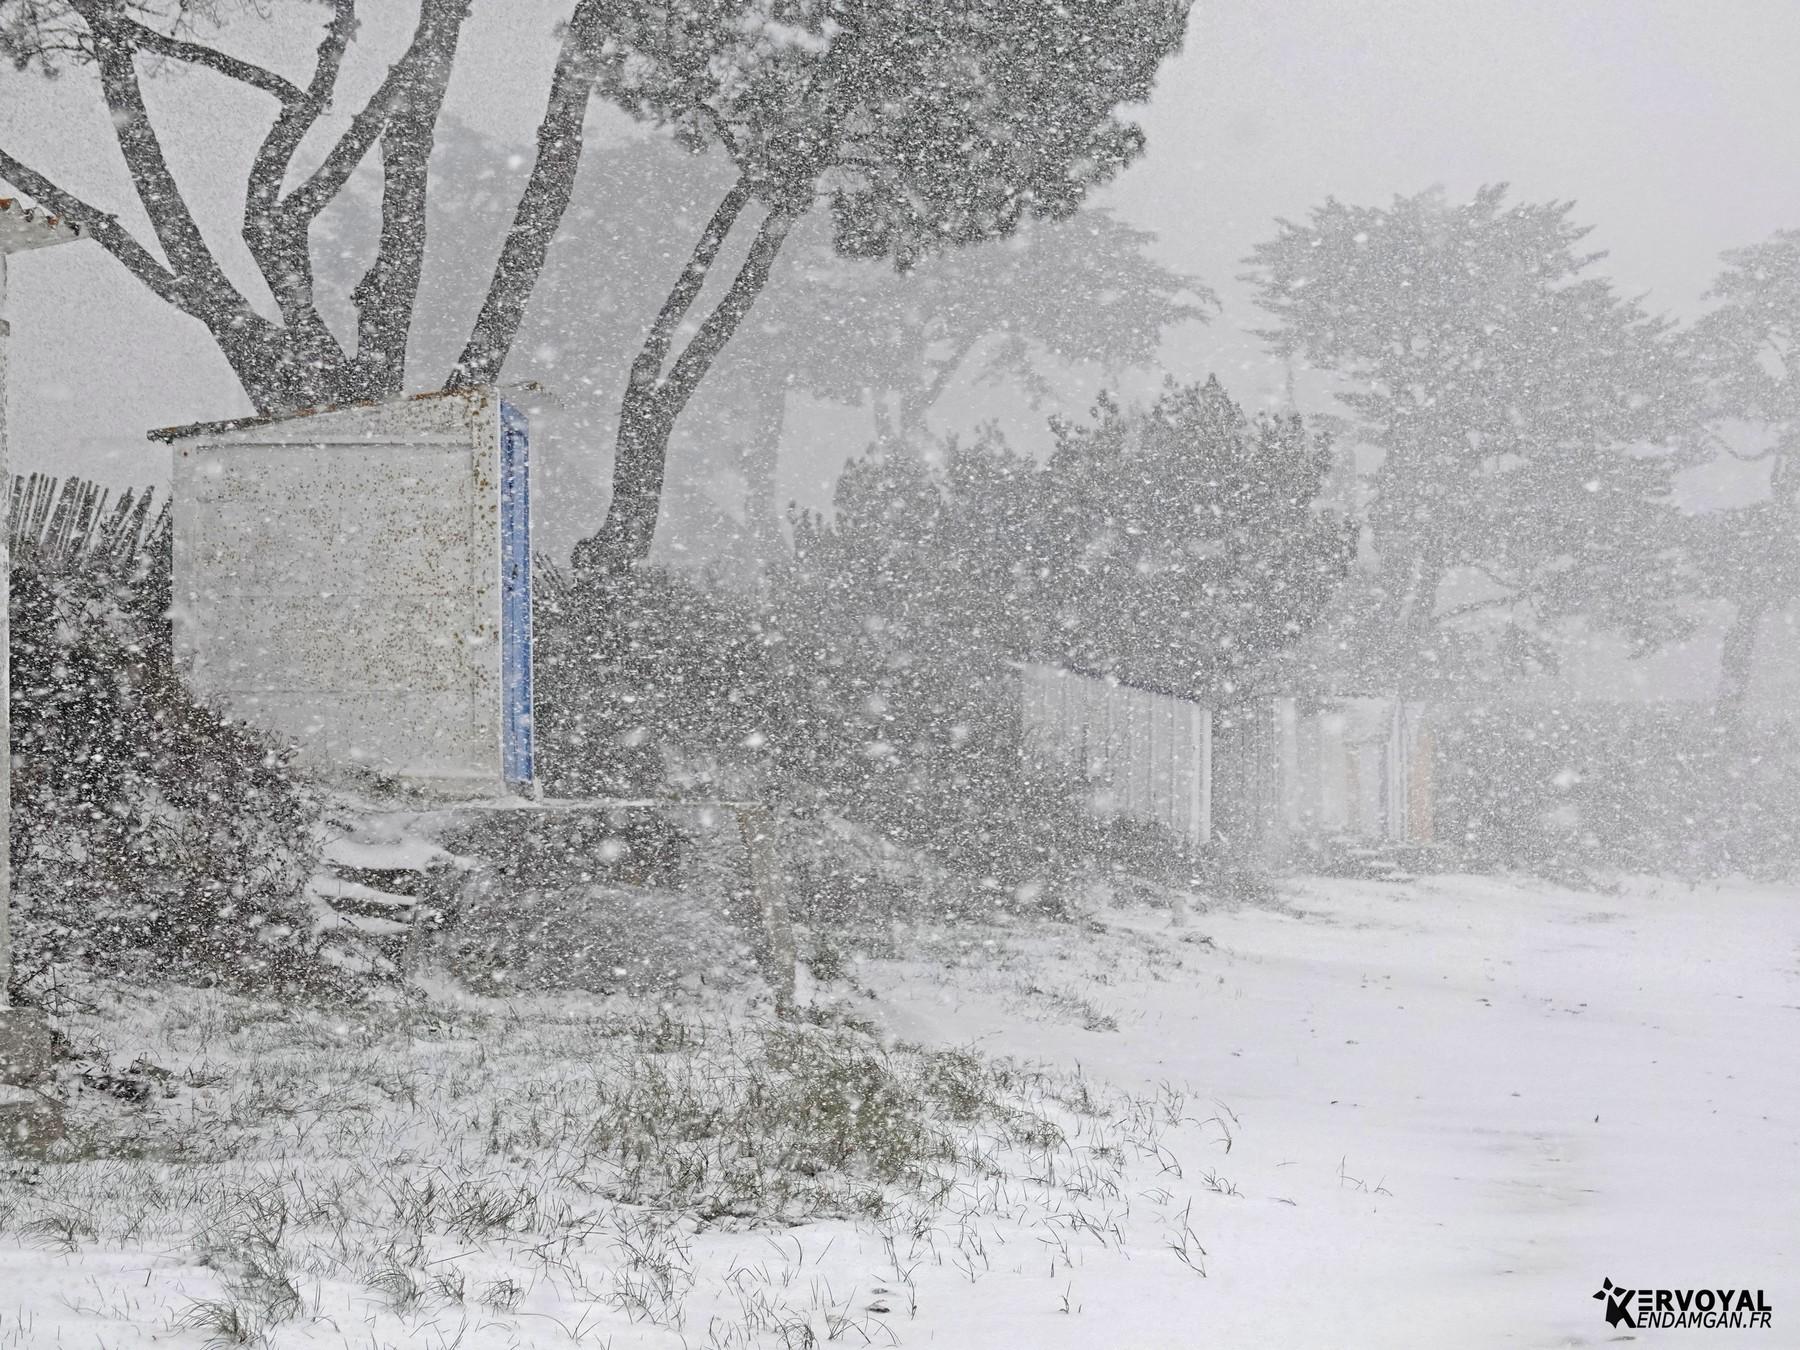 neige à kervoyal 11 février 2021 damgan morbihan (25)